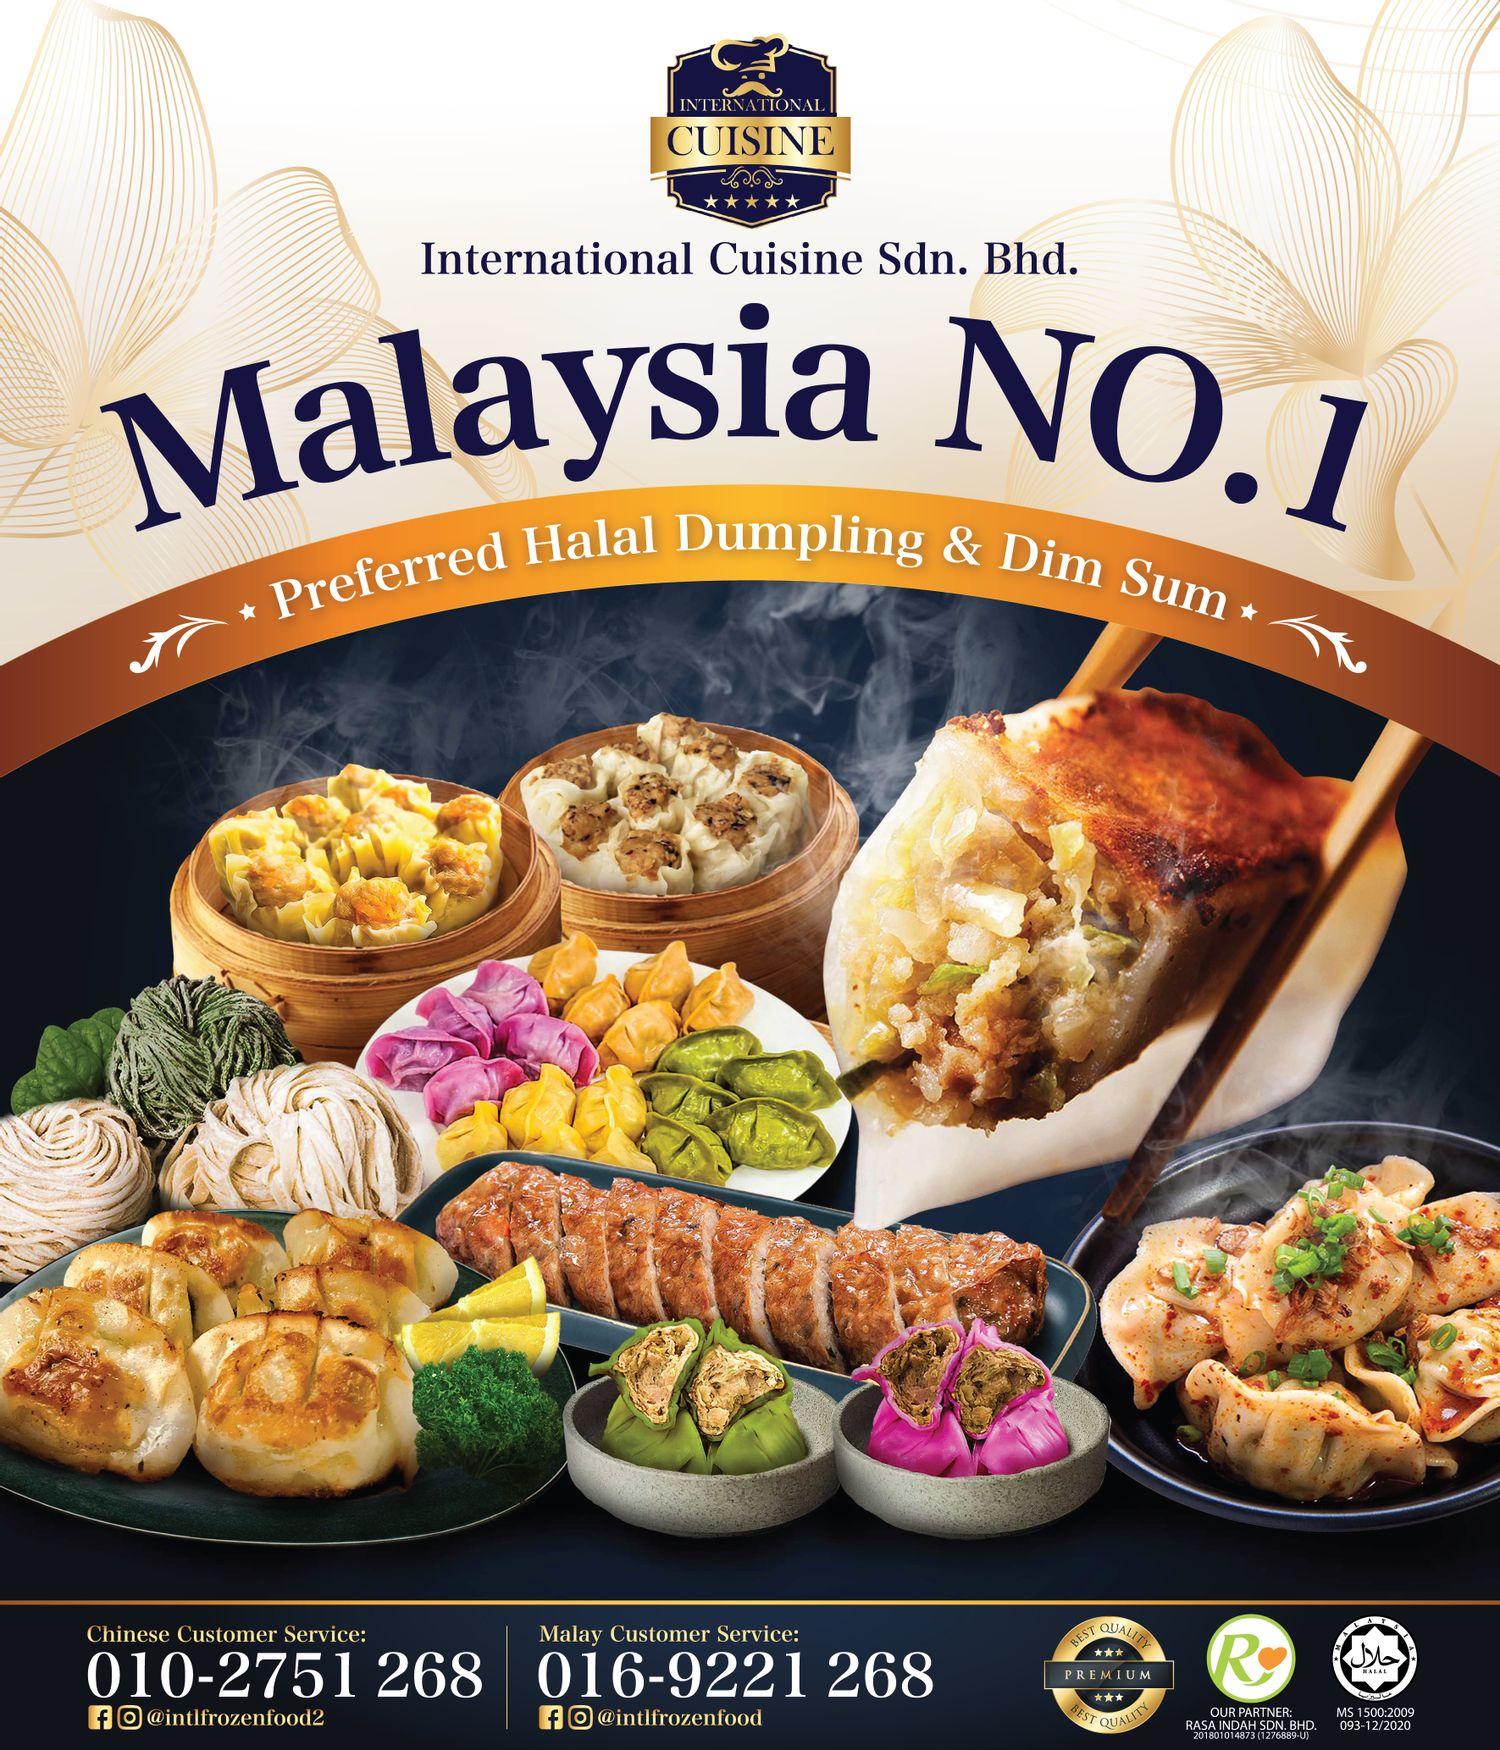 International Cuisine Sdn Bhd |